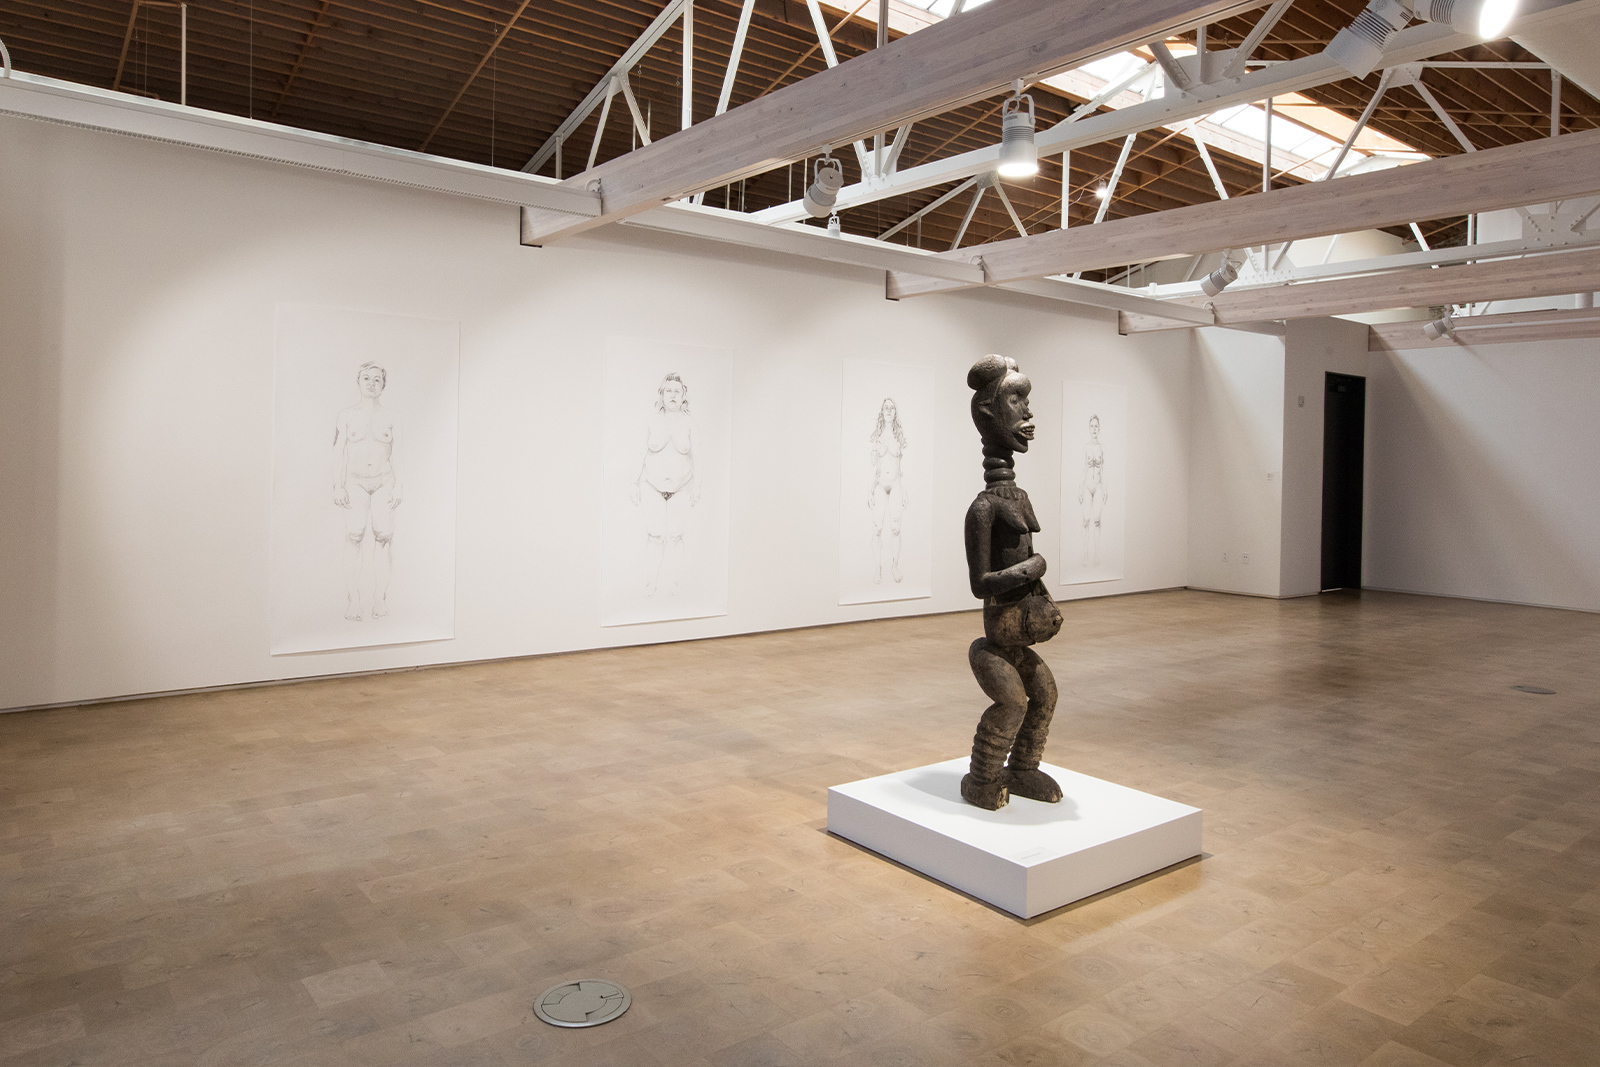 Union-gallery-zoecharlton10